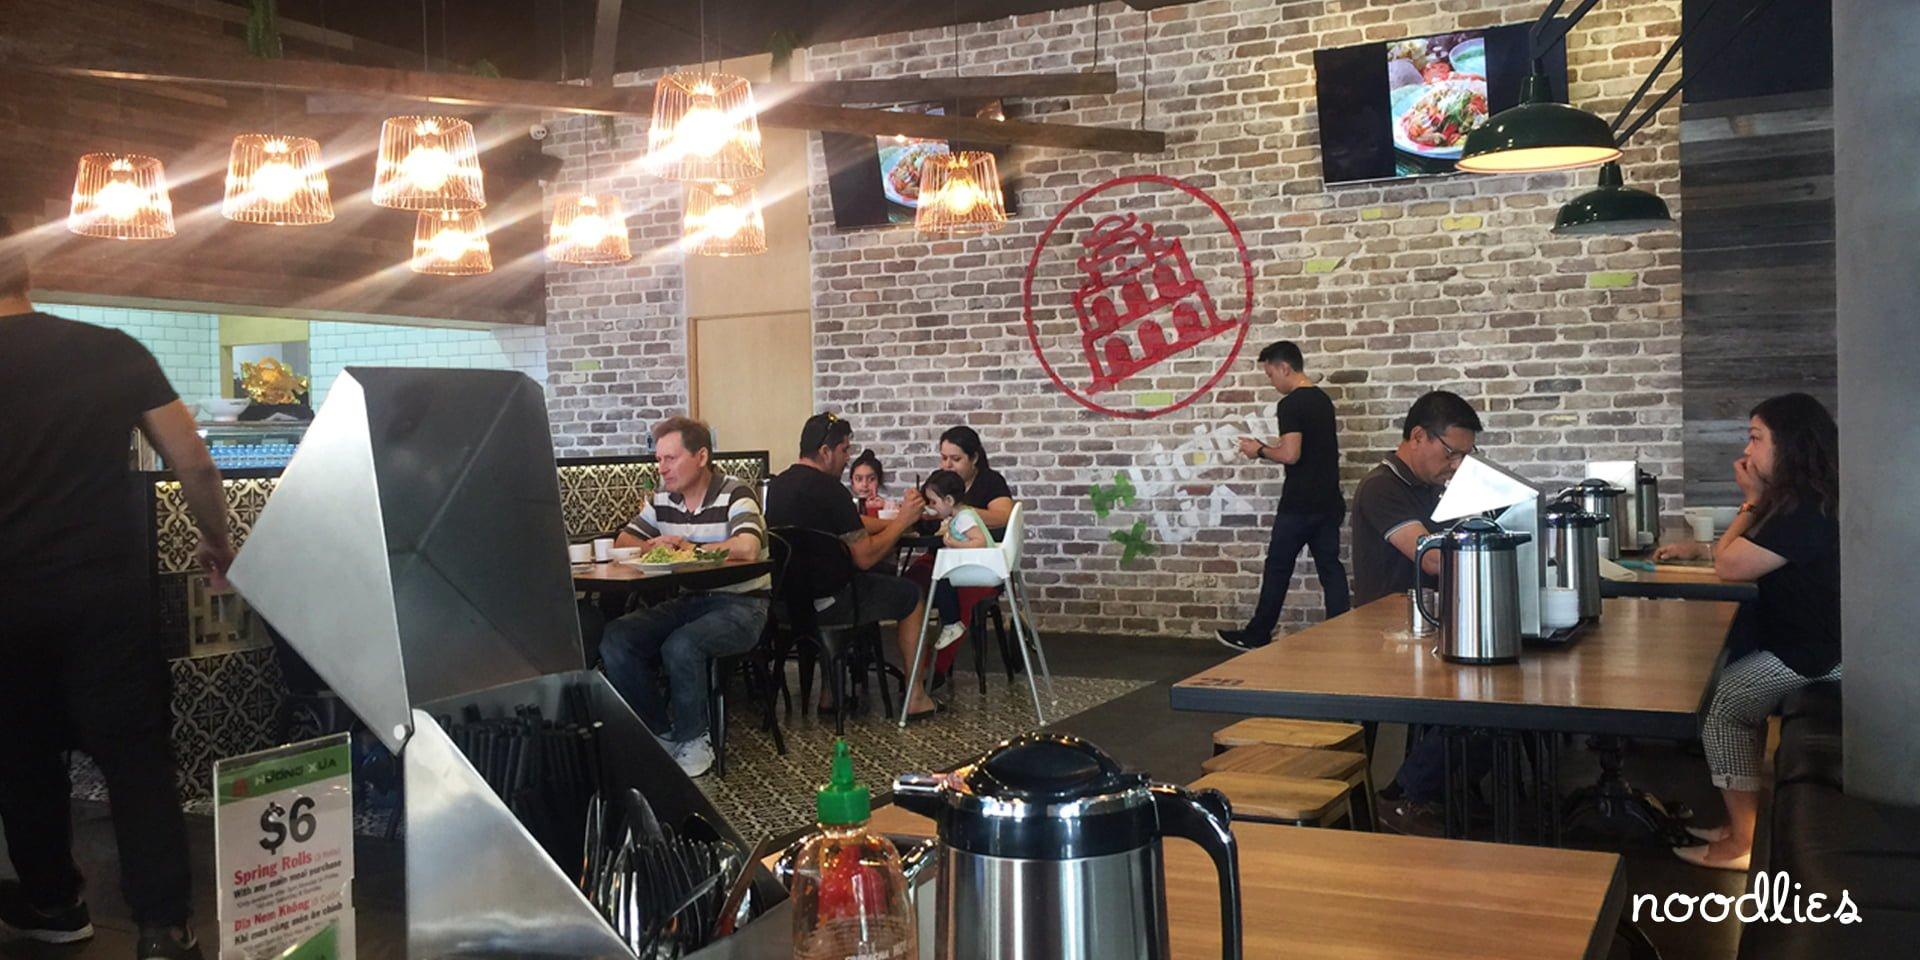 Huong Xua, Vietnamese, Liverpool   noodlies - A Sydney food blog by Thang Ngo